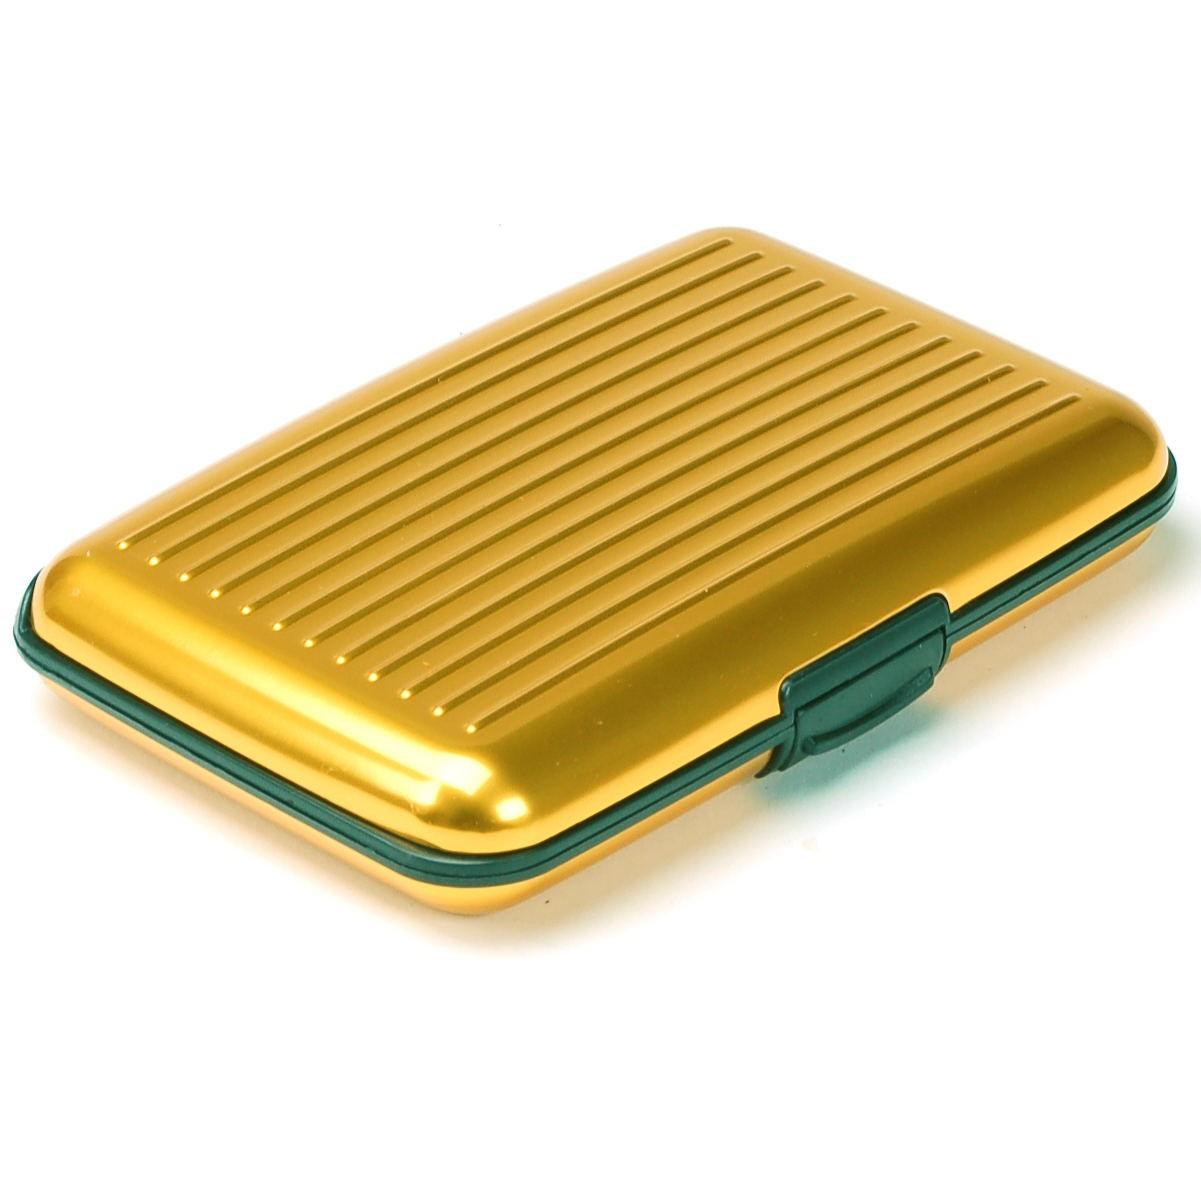 Aluminum Wallet Credit Card Holder Rfid Protection Light